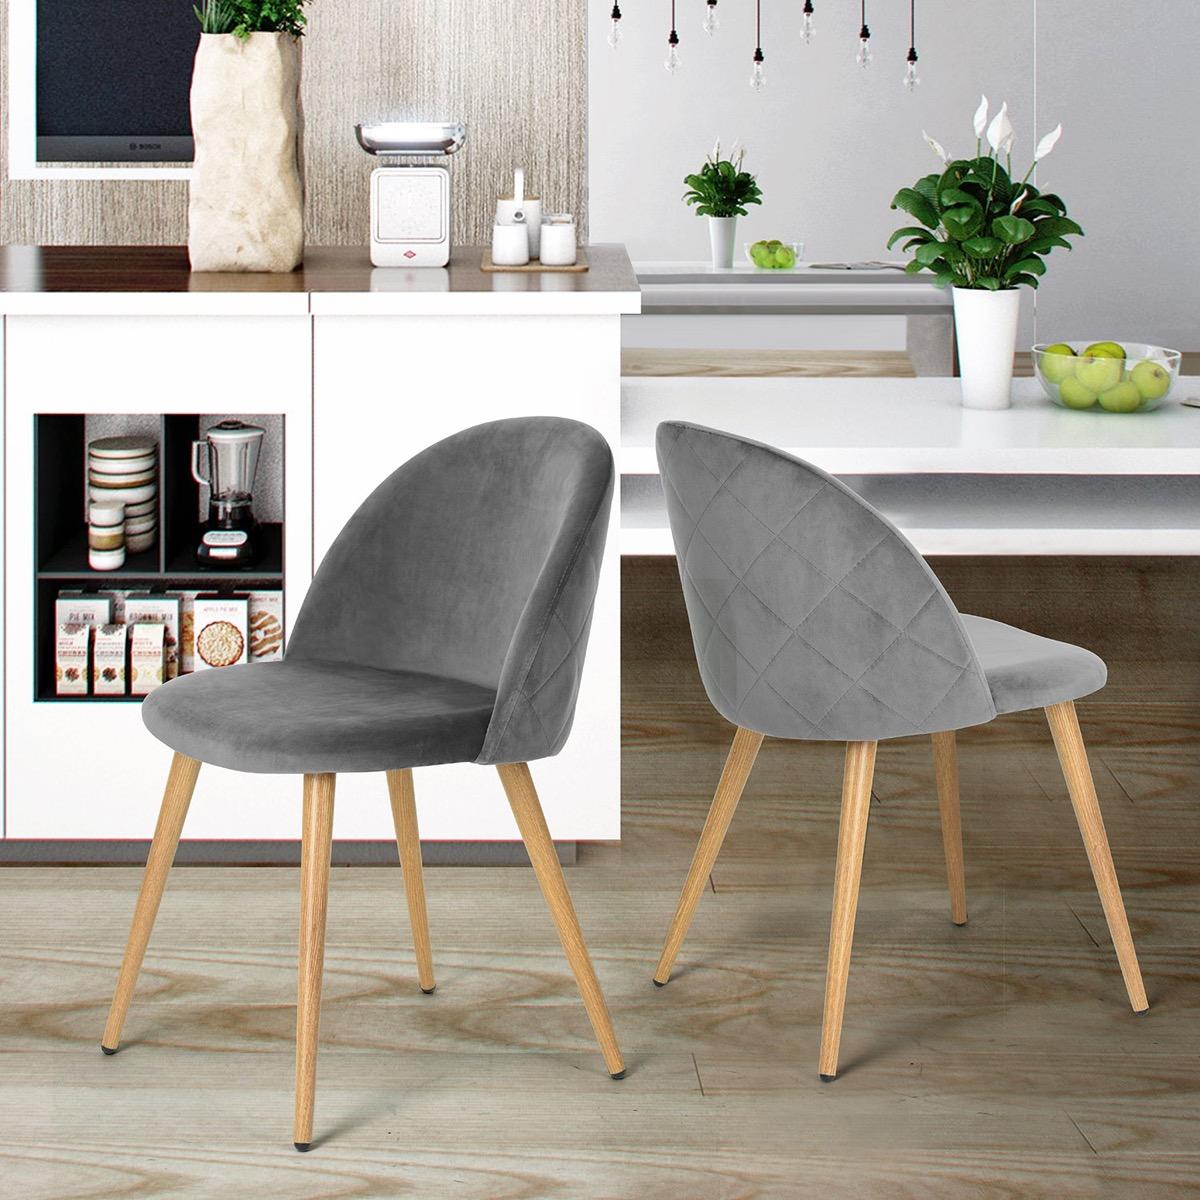 Upholstered-Velvet-Kitchen-Chairs-Armless-Grey-Modern-Seating